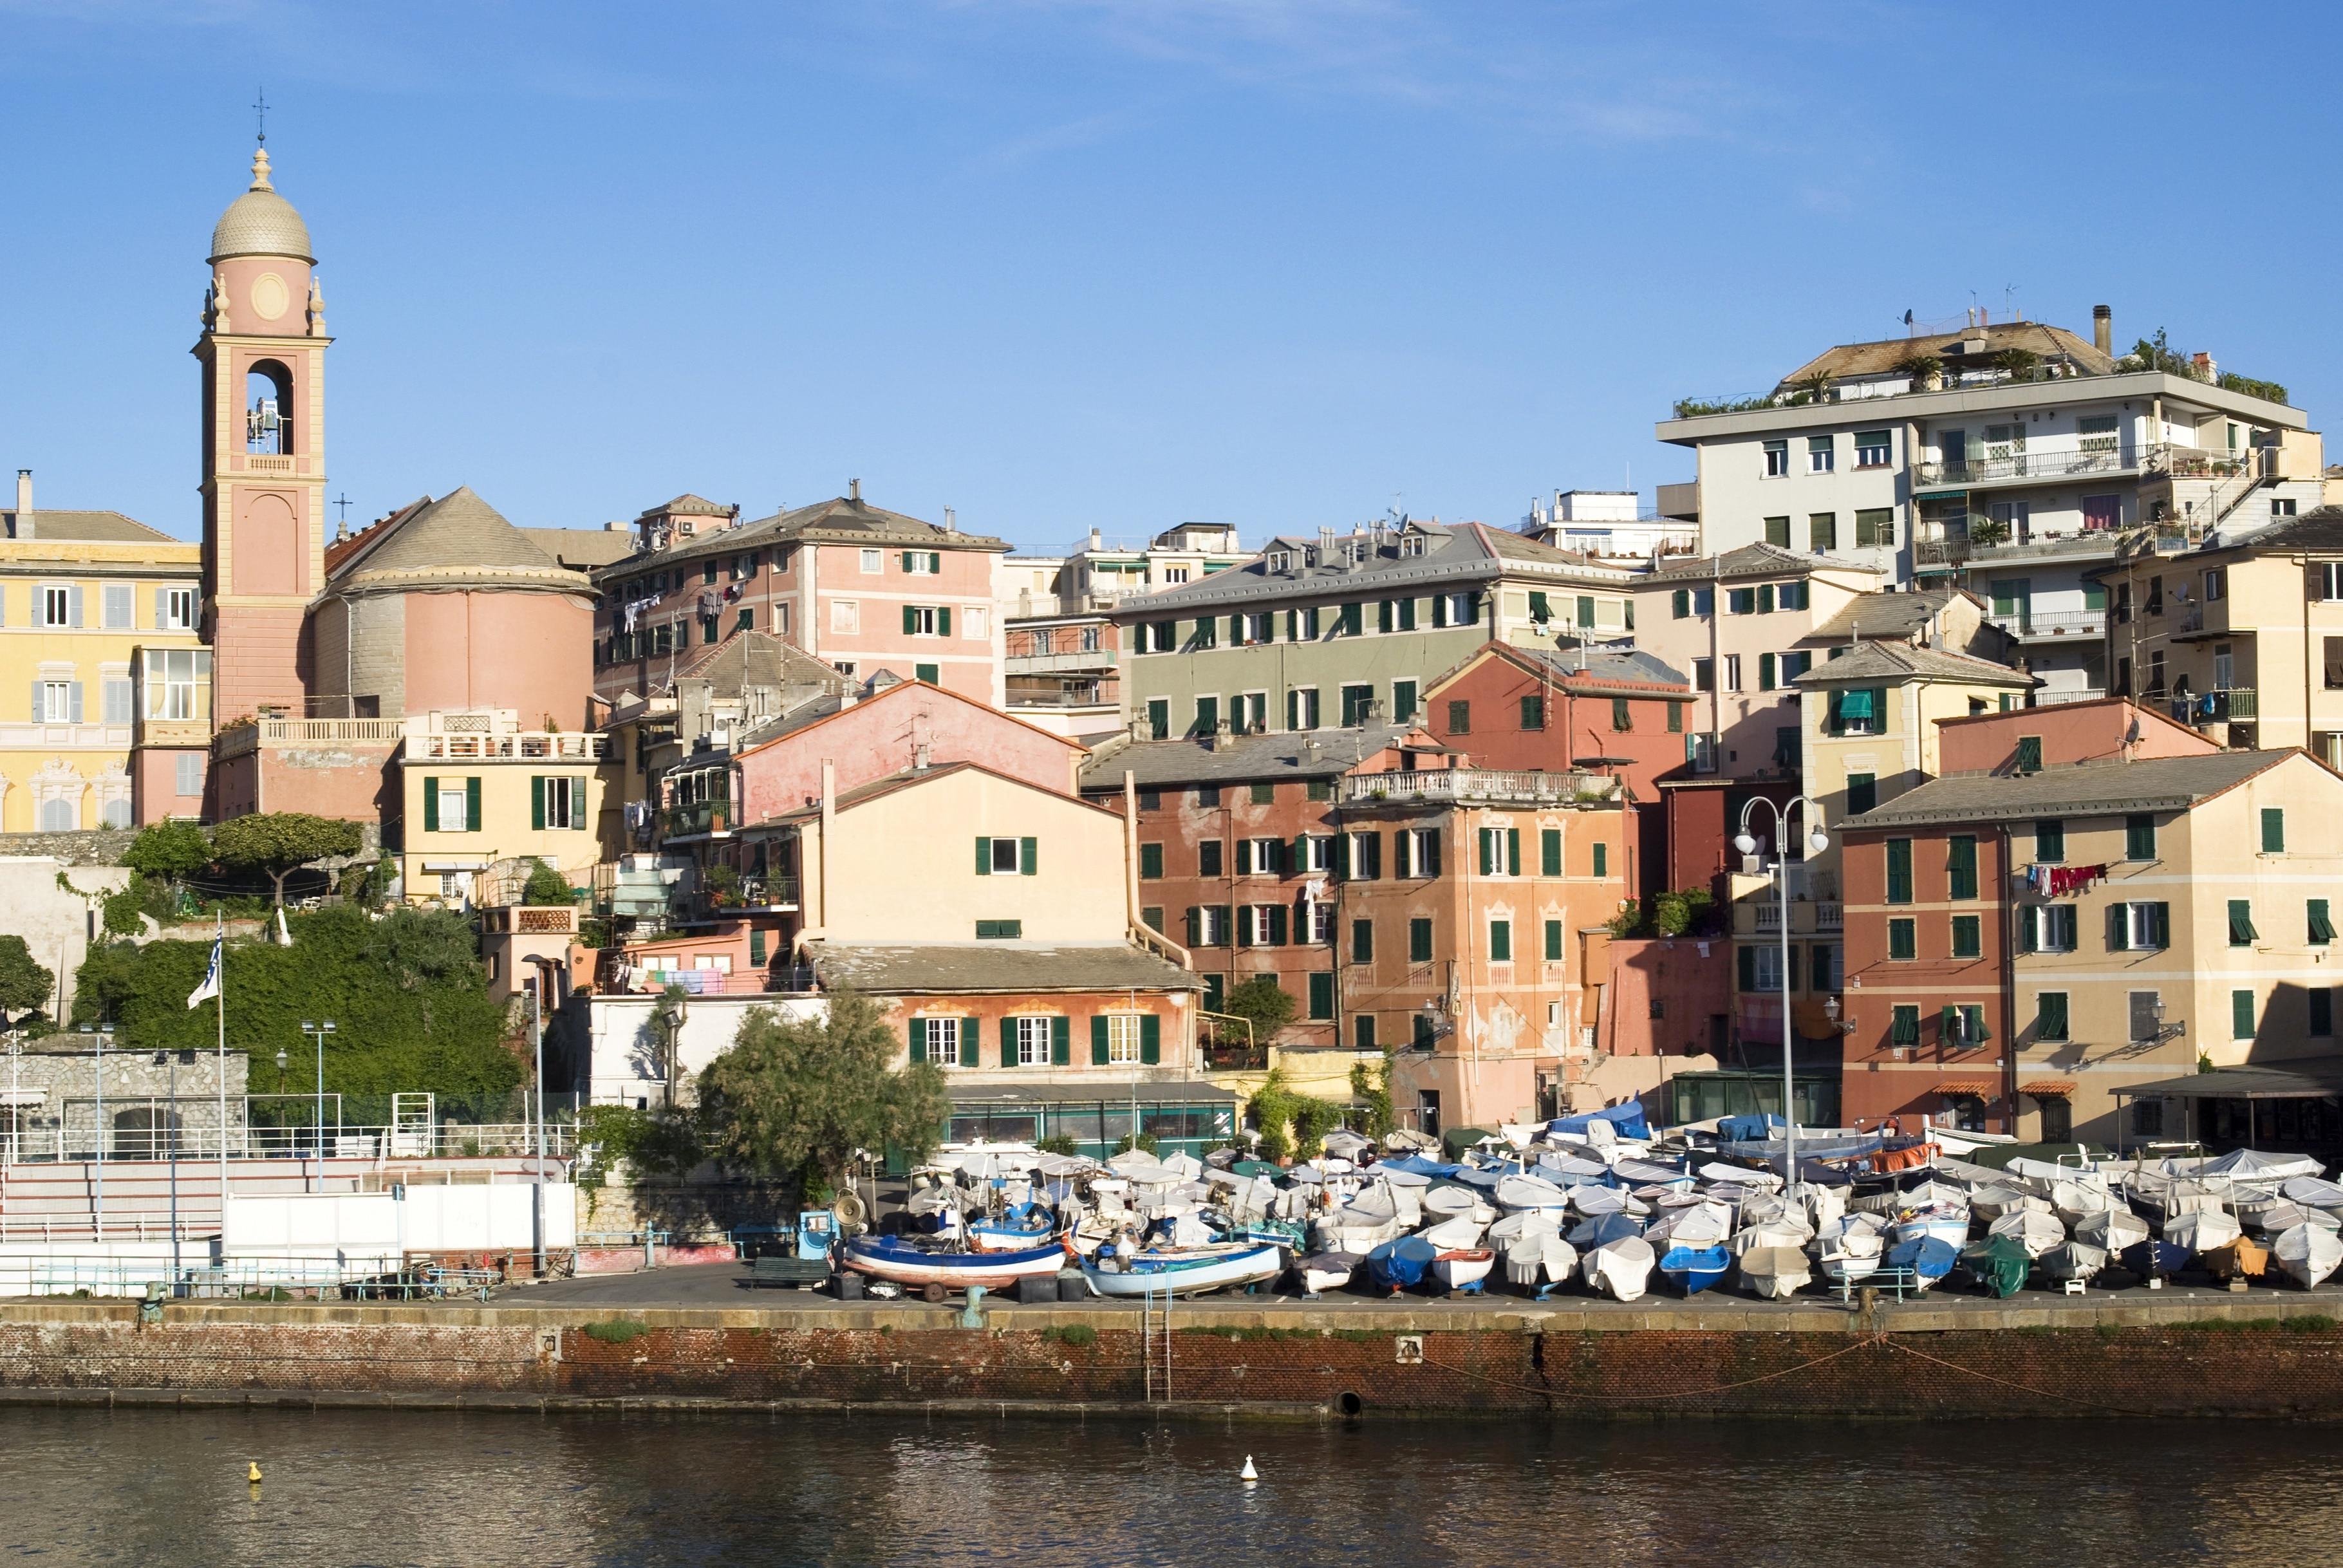 Levante, Liguria, Italy